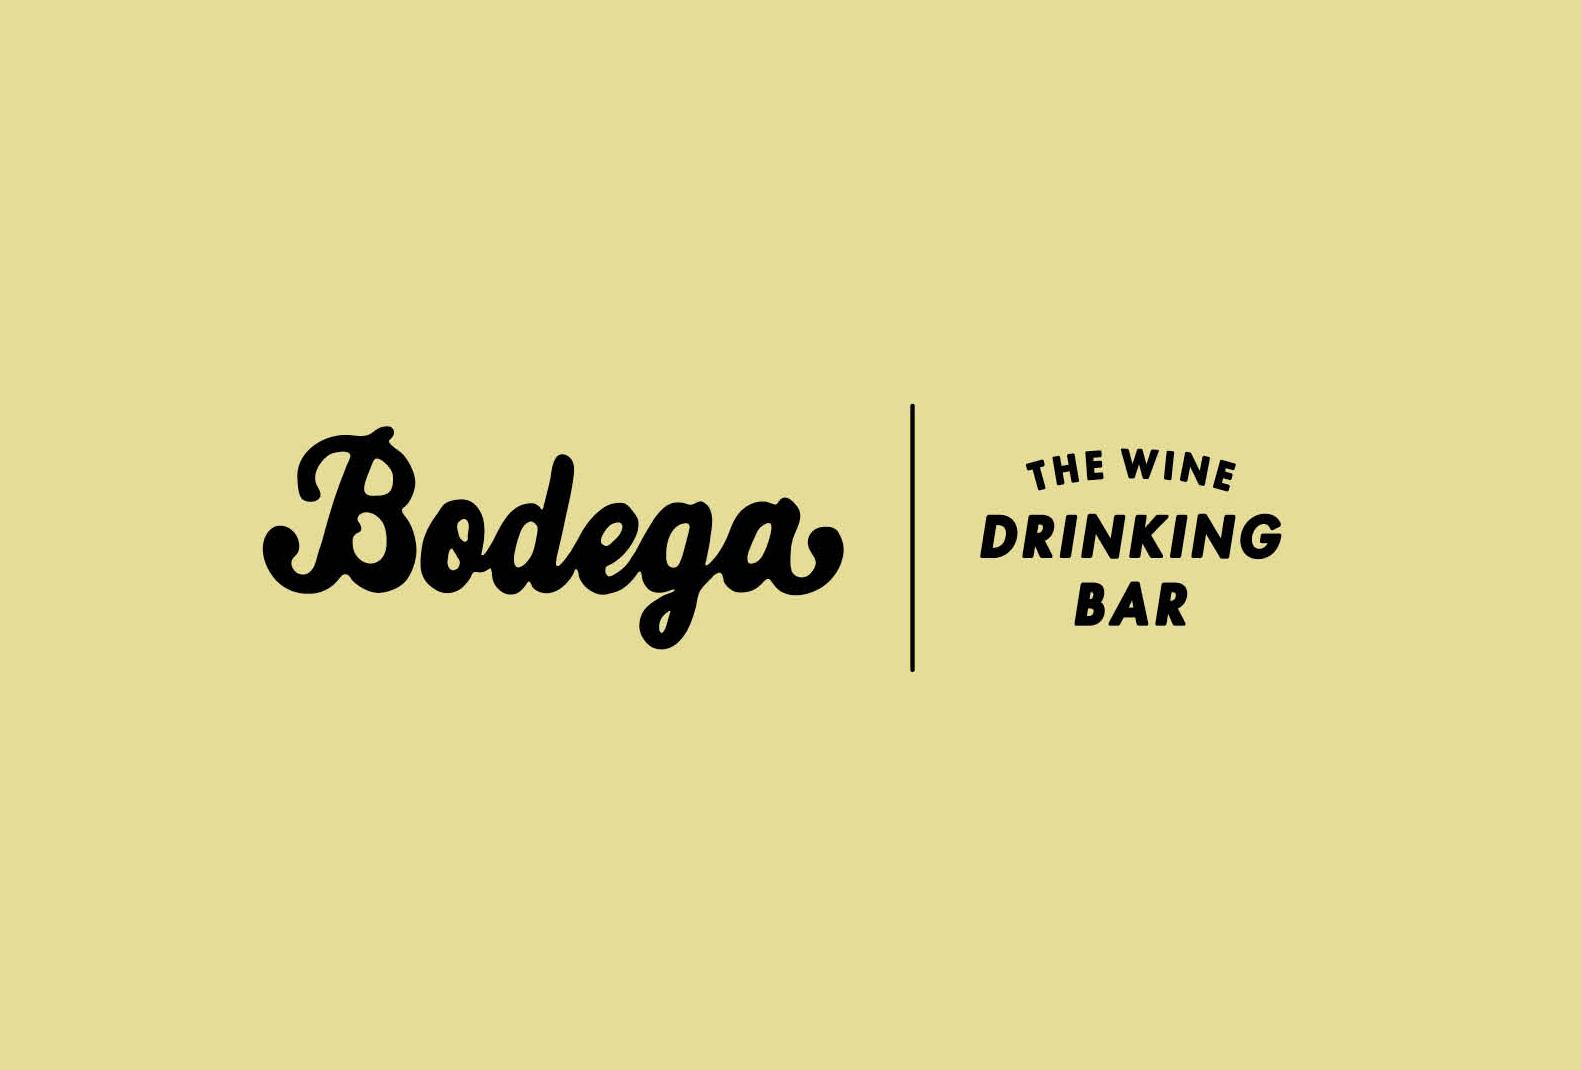 Bodega-Wine-Bar_Ben-Biondo.jpg